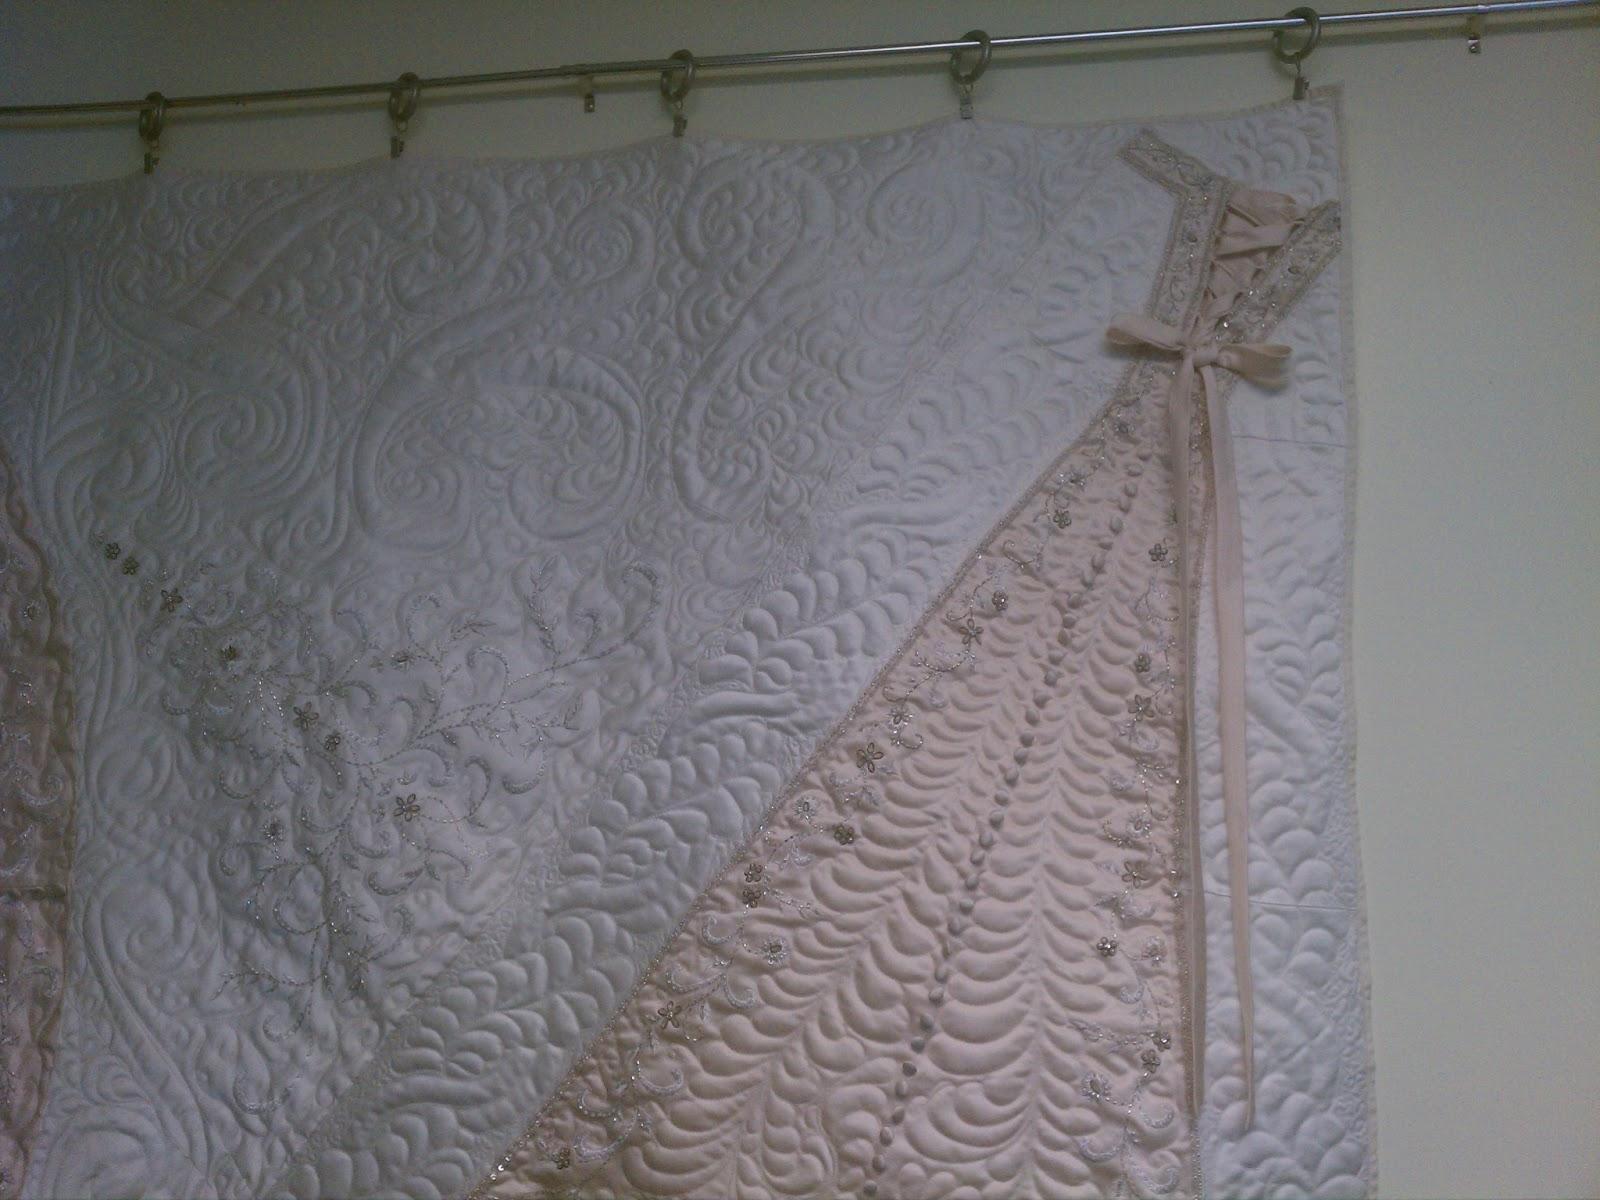 Back Porch Quiltworks: Heirloom wedding dress quilt